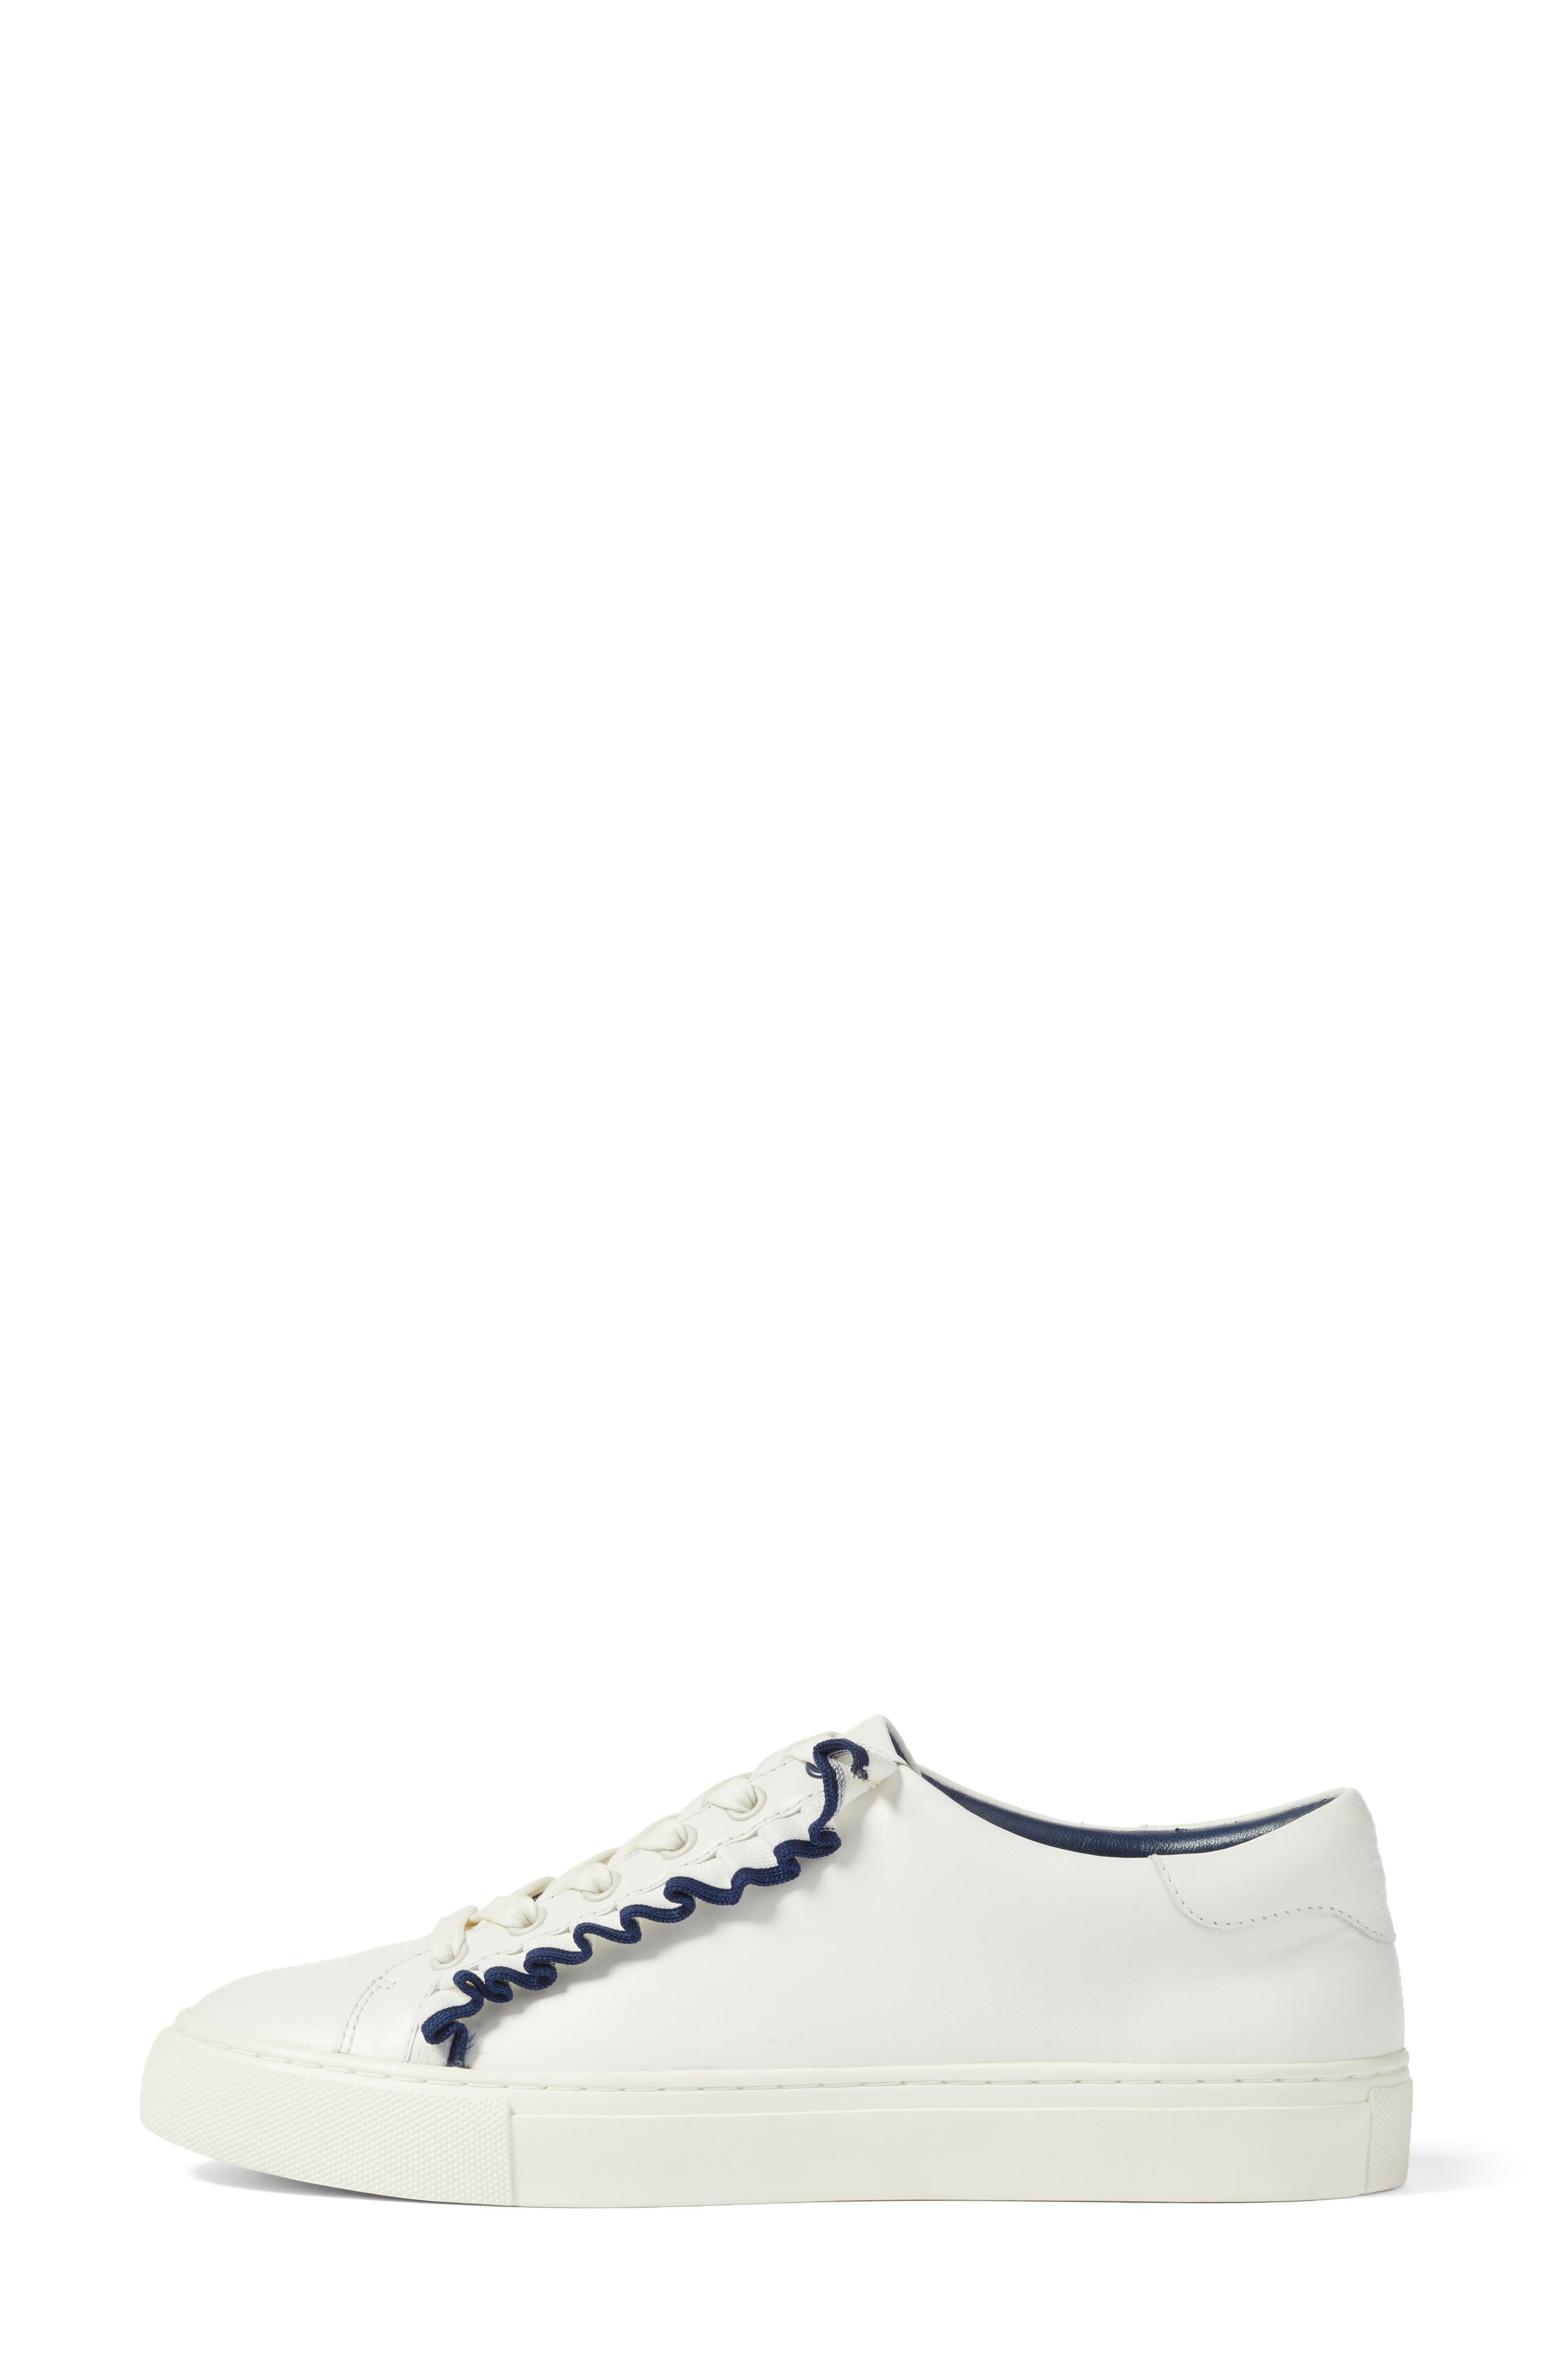 Ruffle Sneaker,                             Alternate thumbnail 3, color,                             Snow White/ Navy Sea